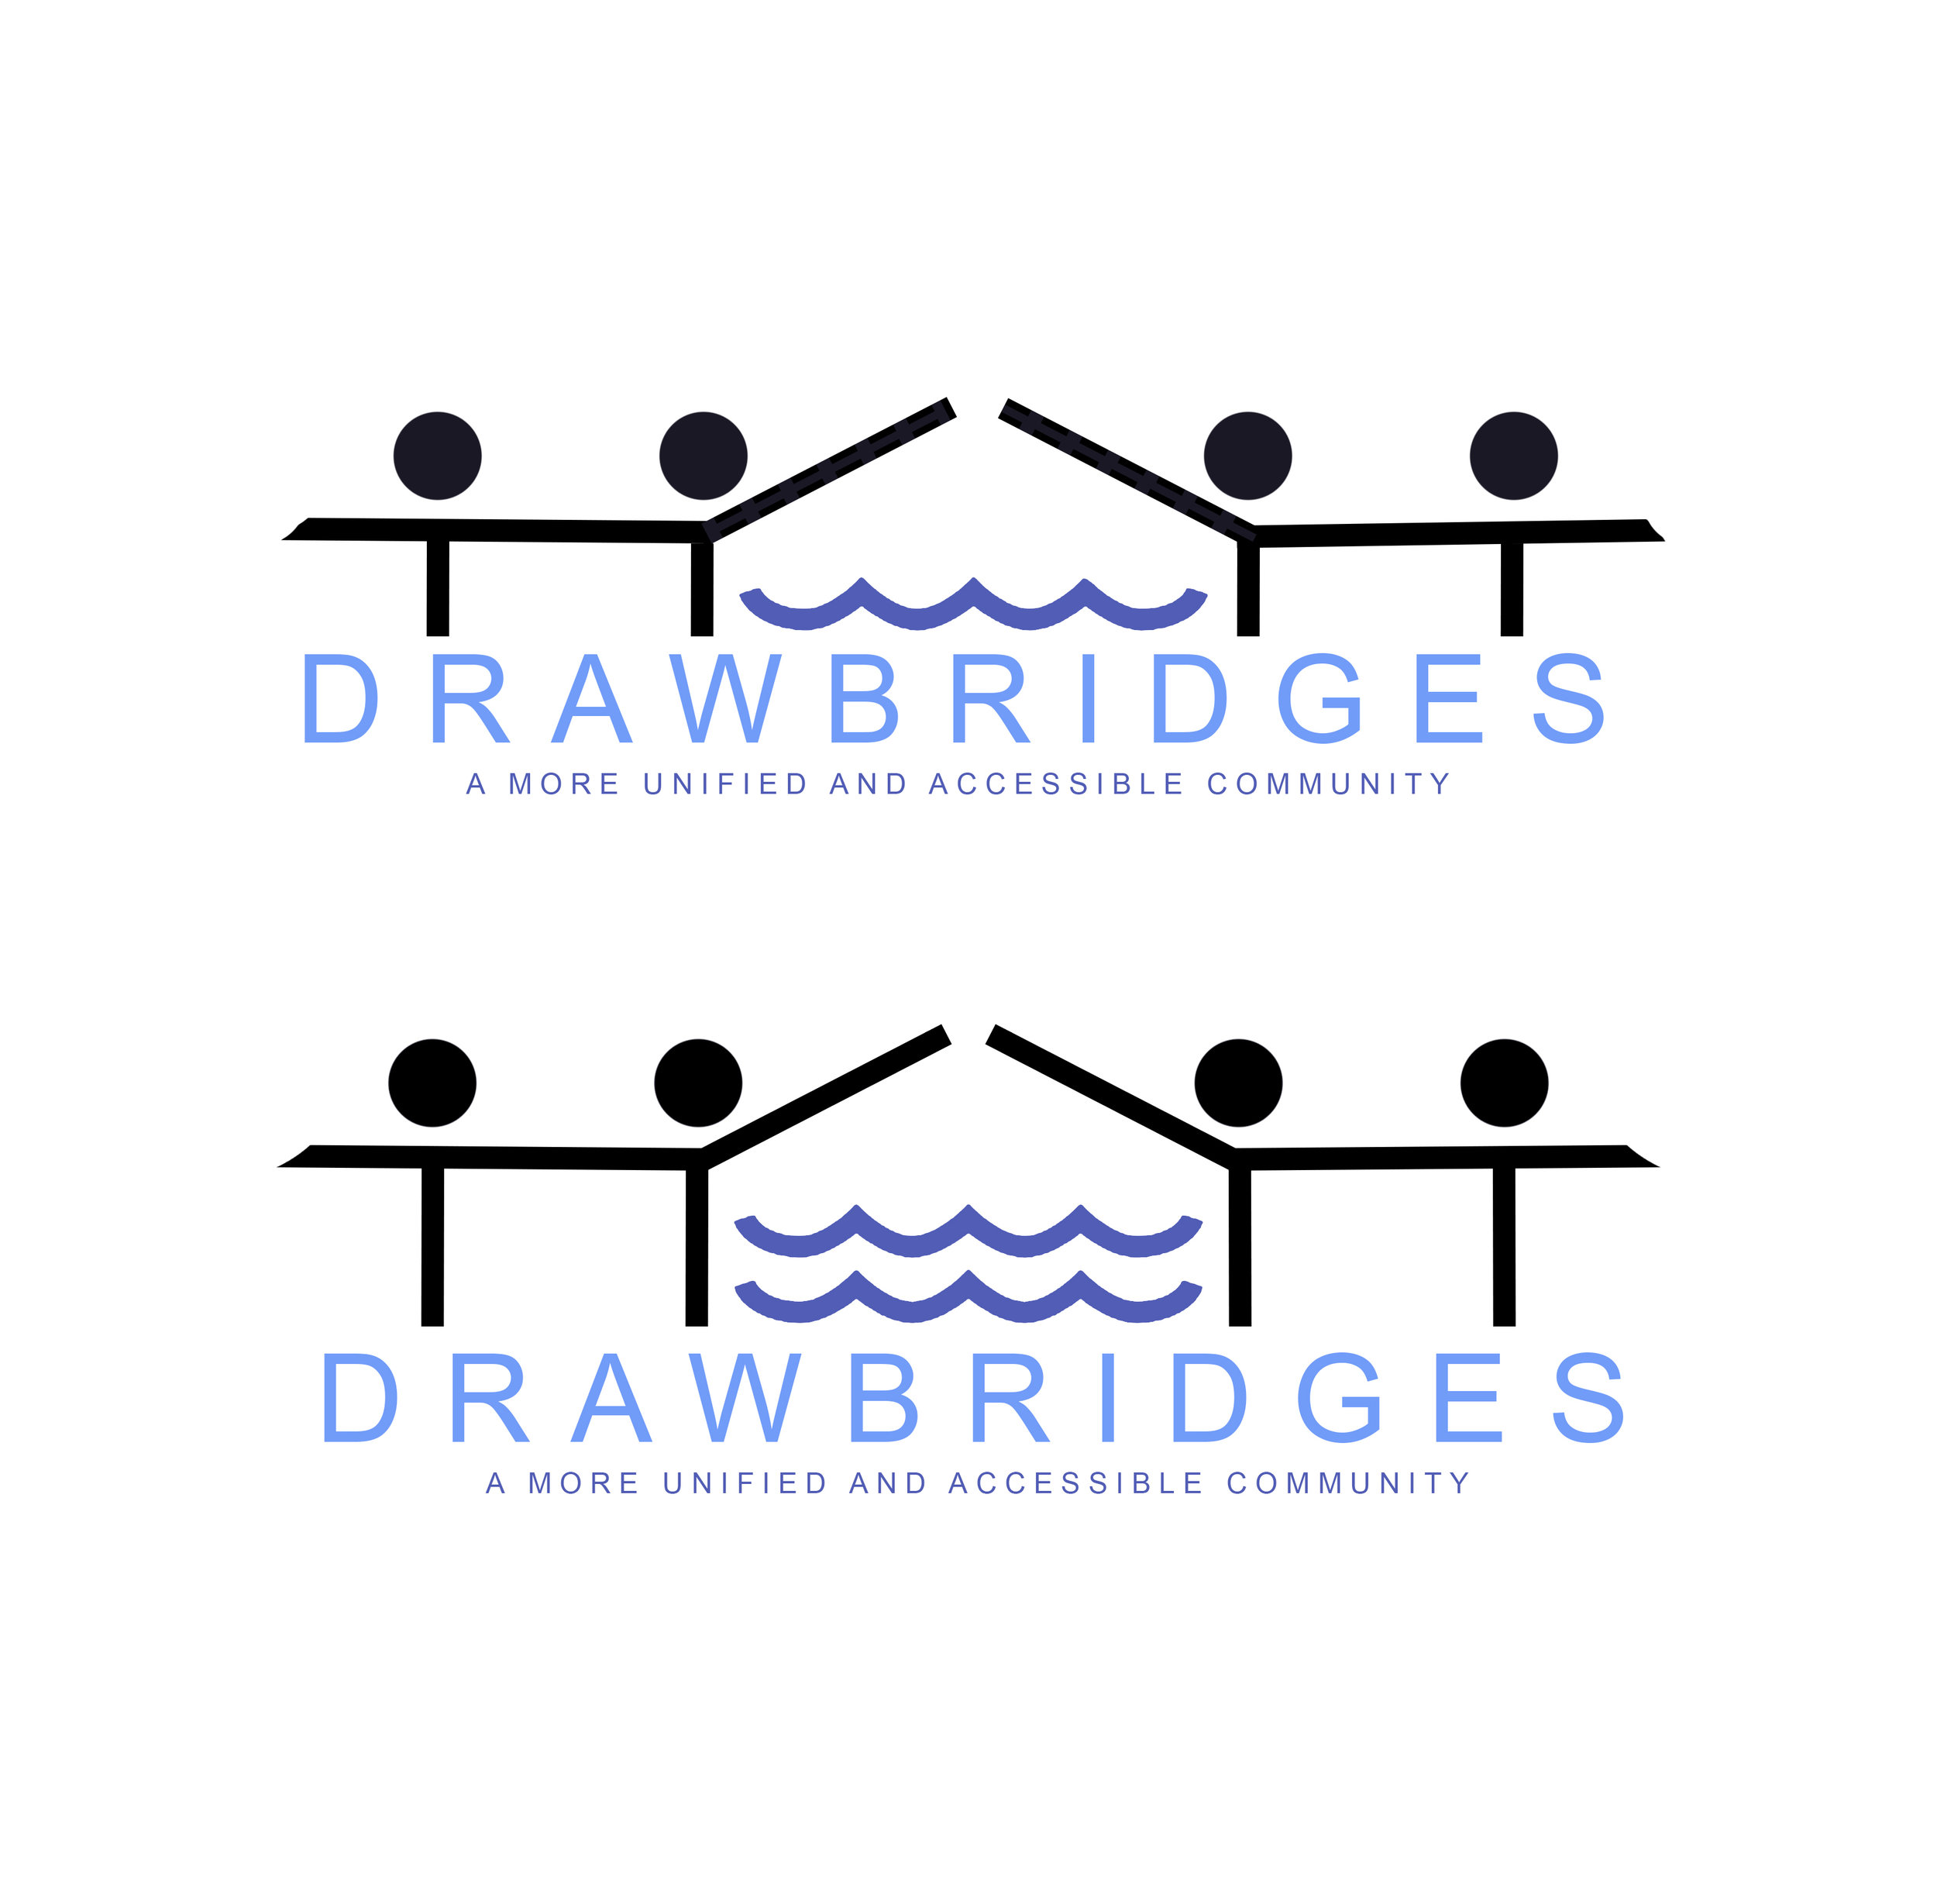 drawbridge concepts 012.jpg